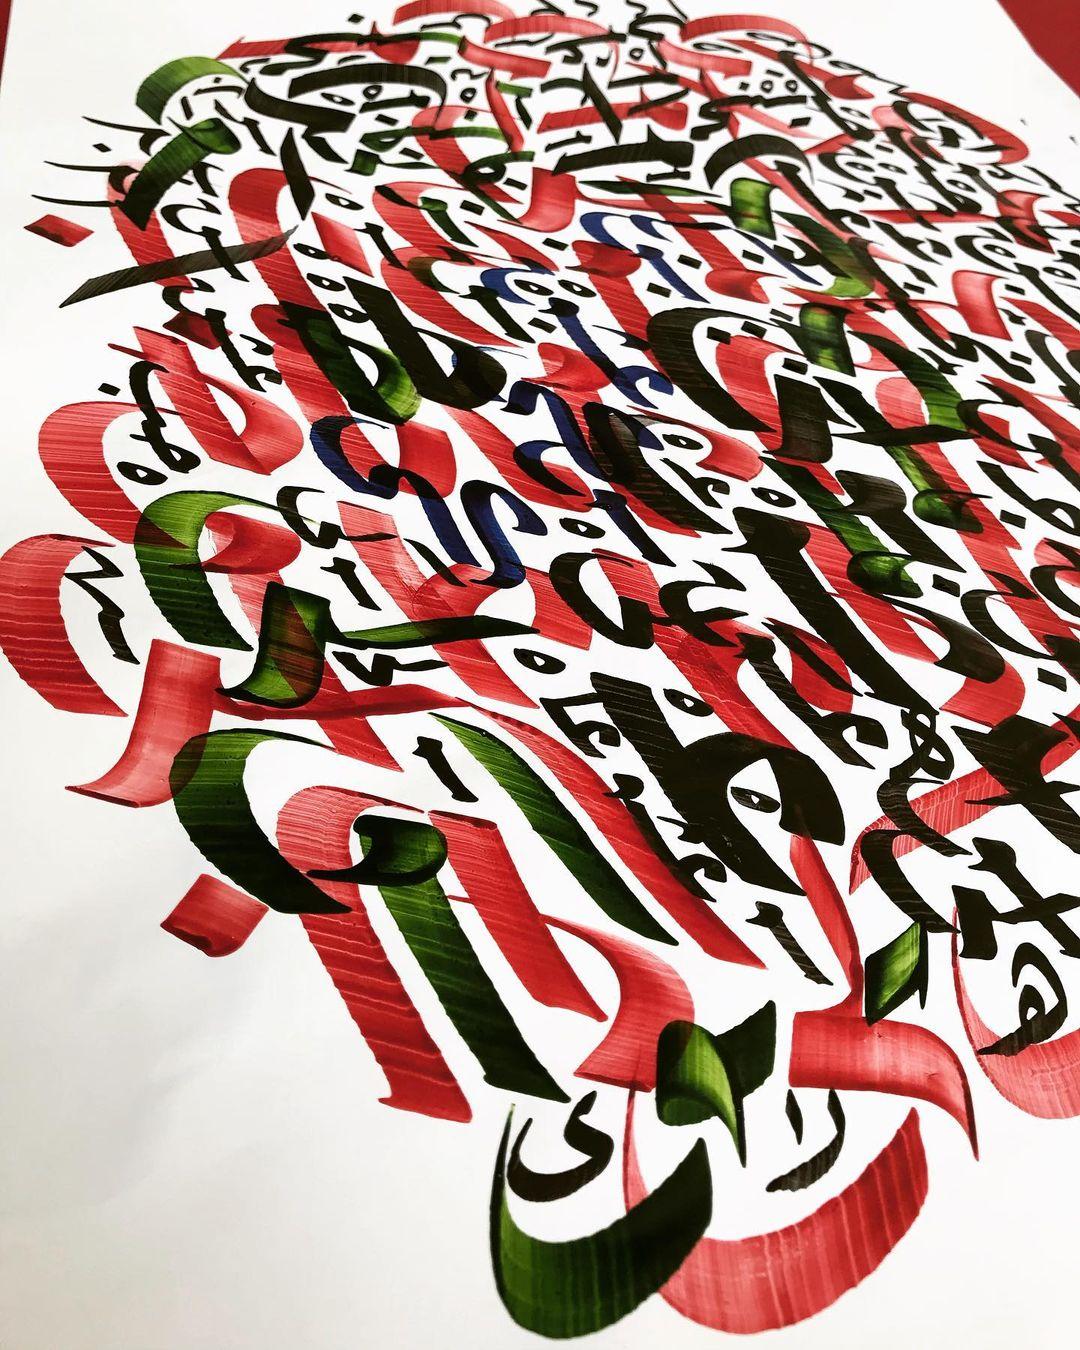 Donwload Photo #exercise #arabiccalligraphy #islamiccalligraphy #tezhip #hüsnühat #hüsnihat …- hattat_aa